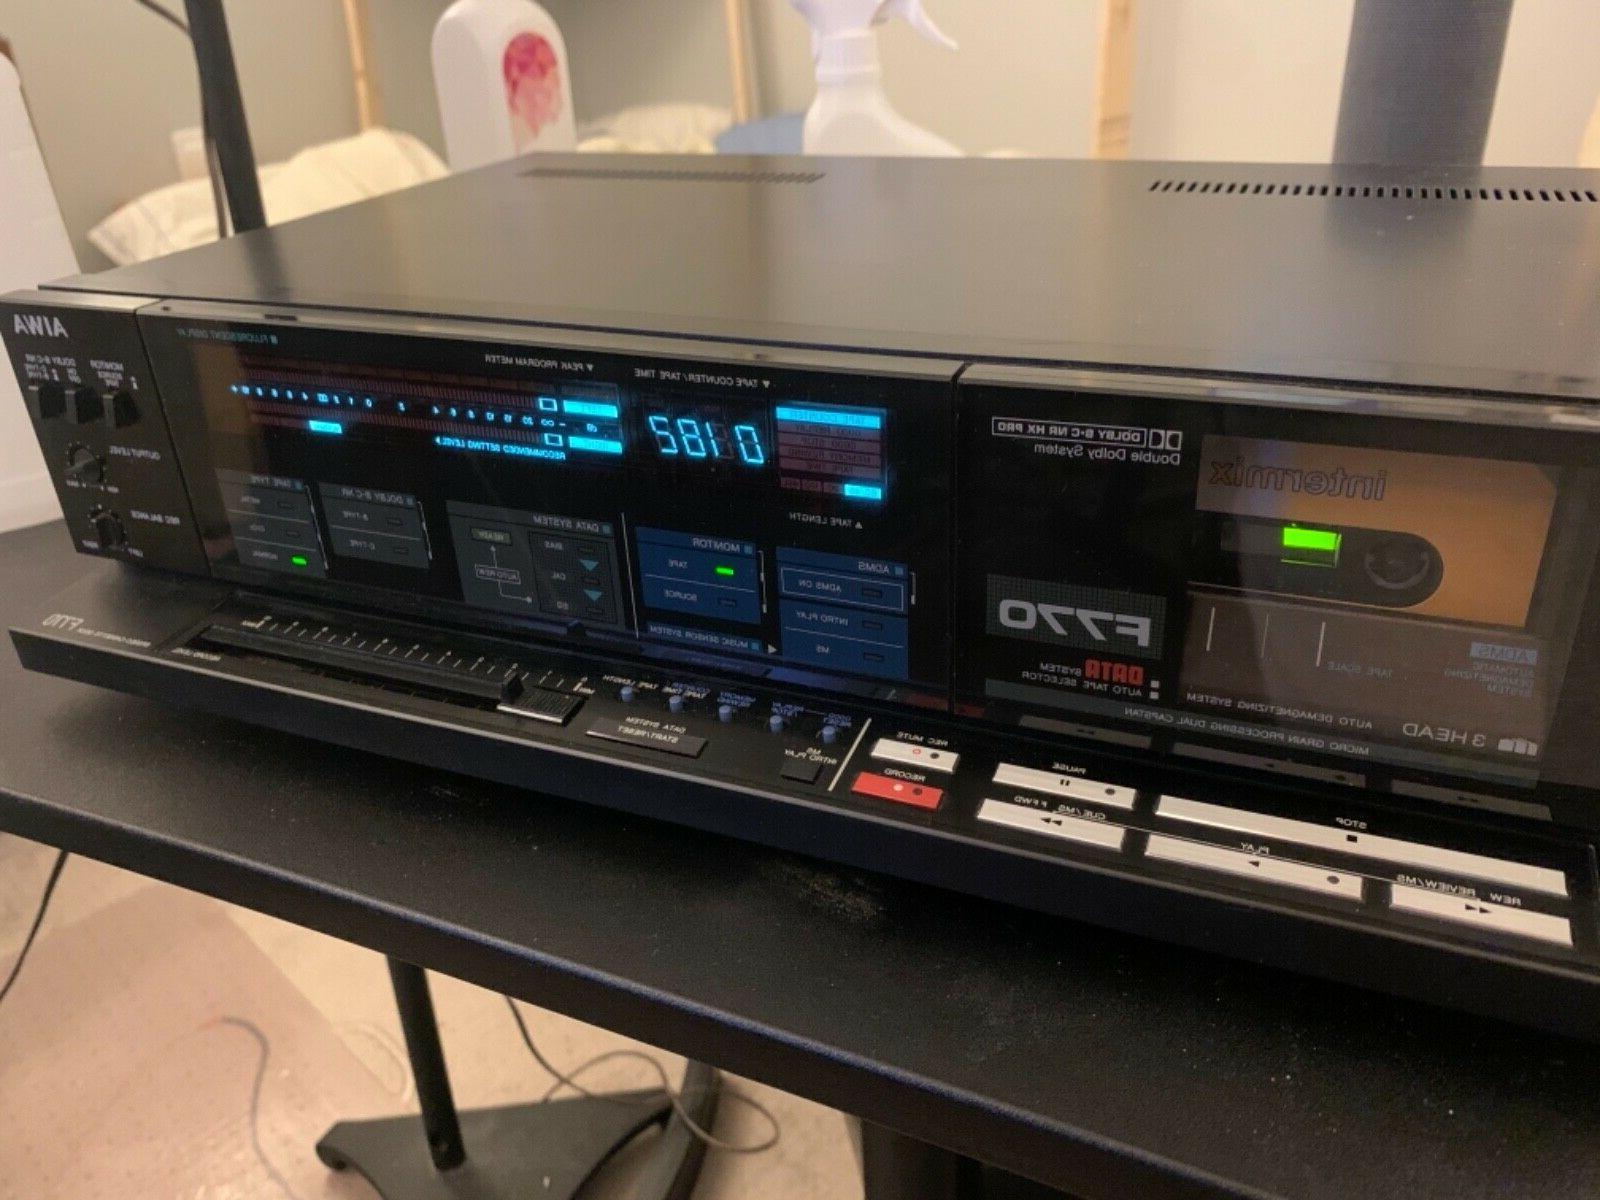 ad f770 3 head cassette deck